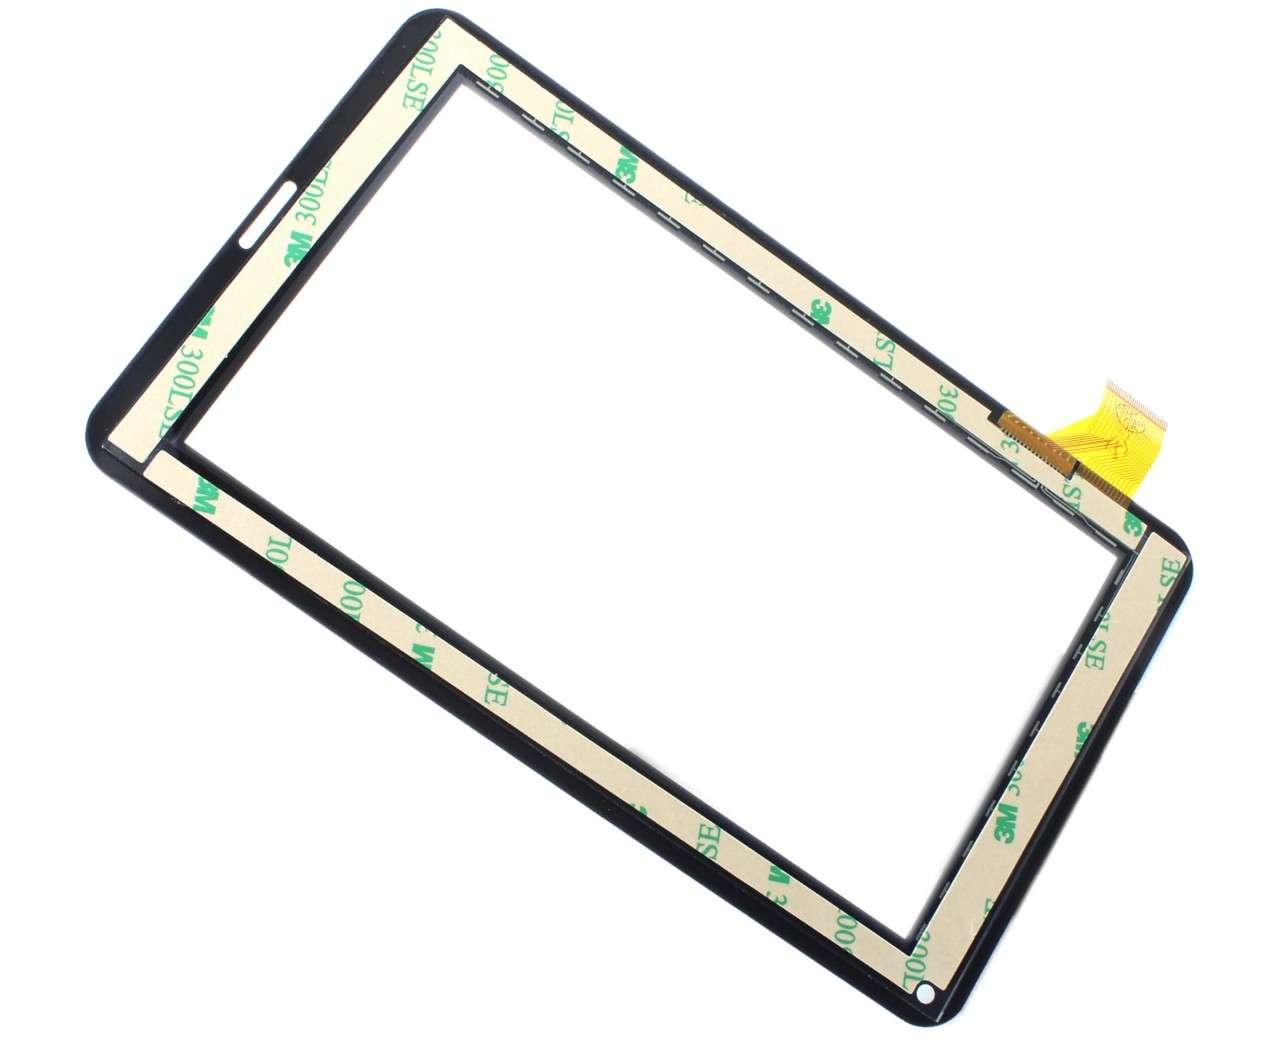 Touchscreen Digitizer InfoTouch iTab 703 Geam Sticla Tableta imagine powerlaptop.ro 2021